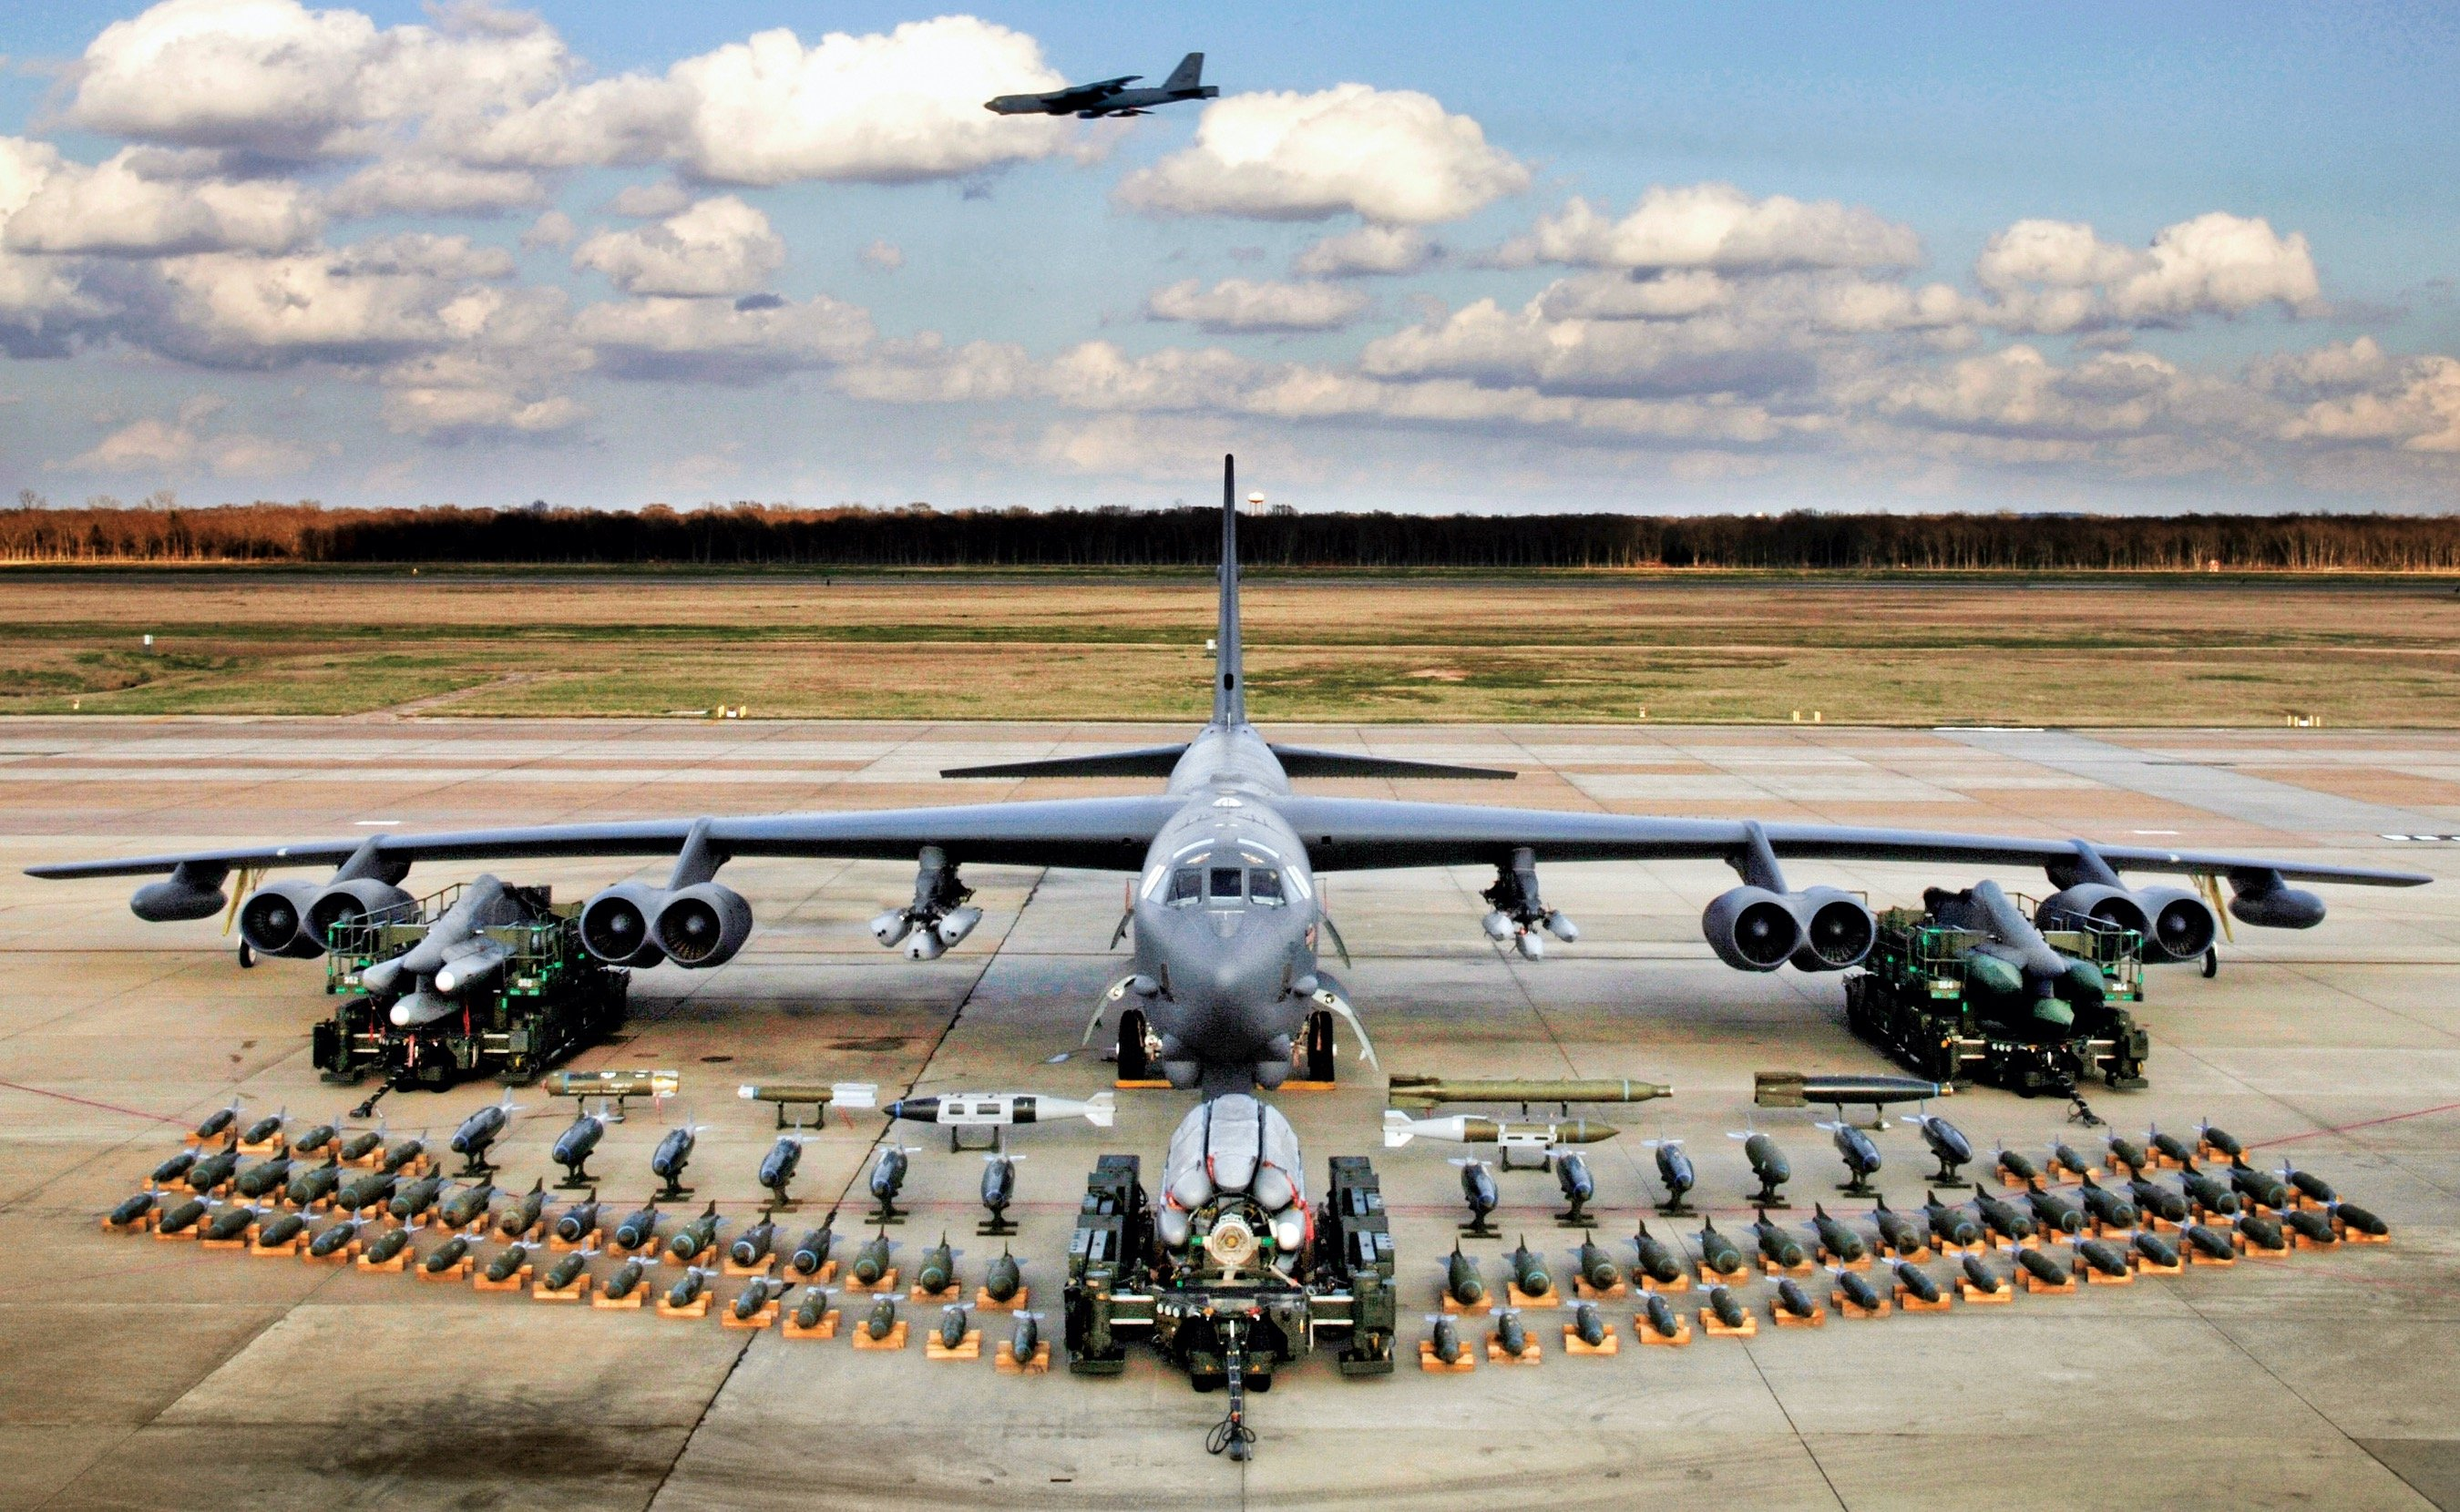 2020 B-52 unboxing photos